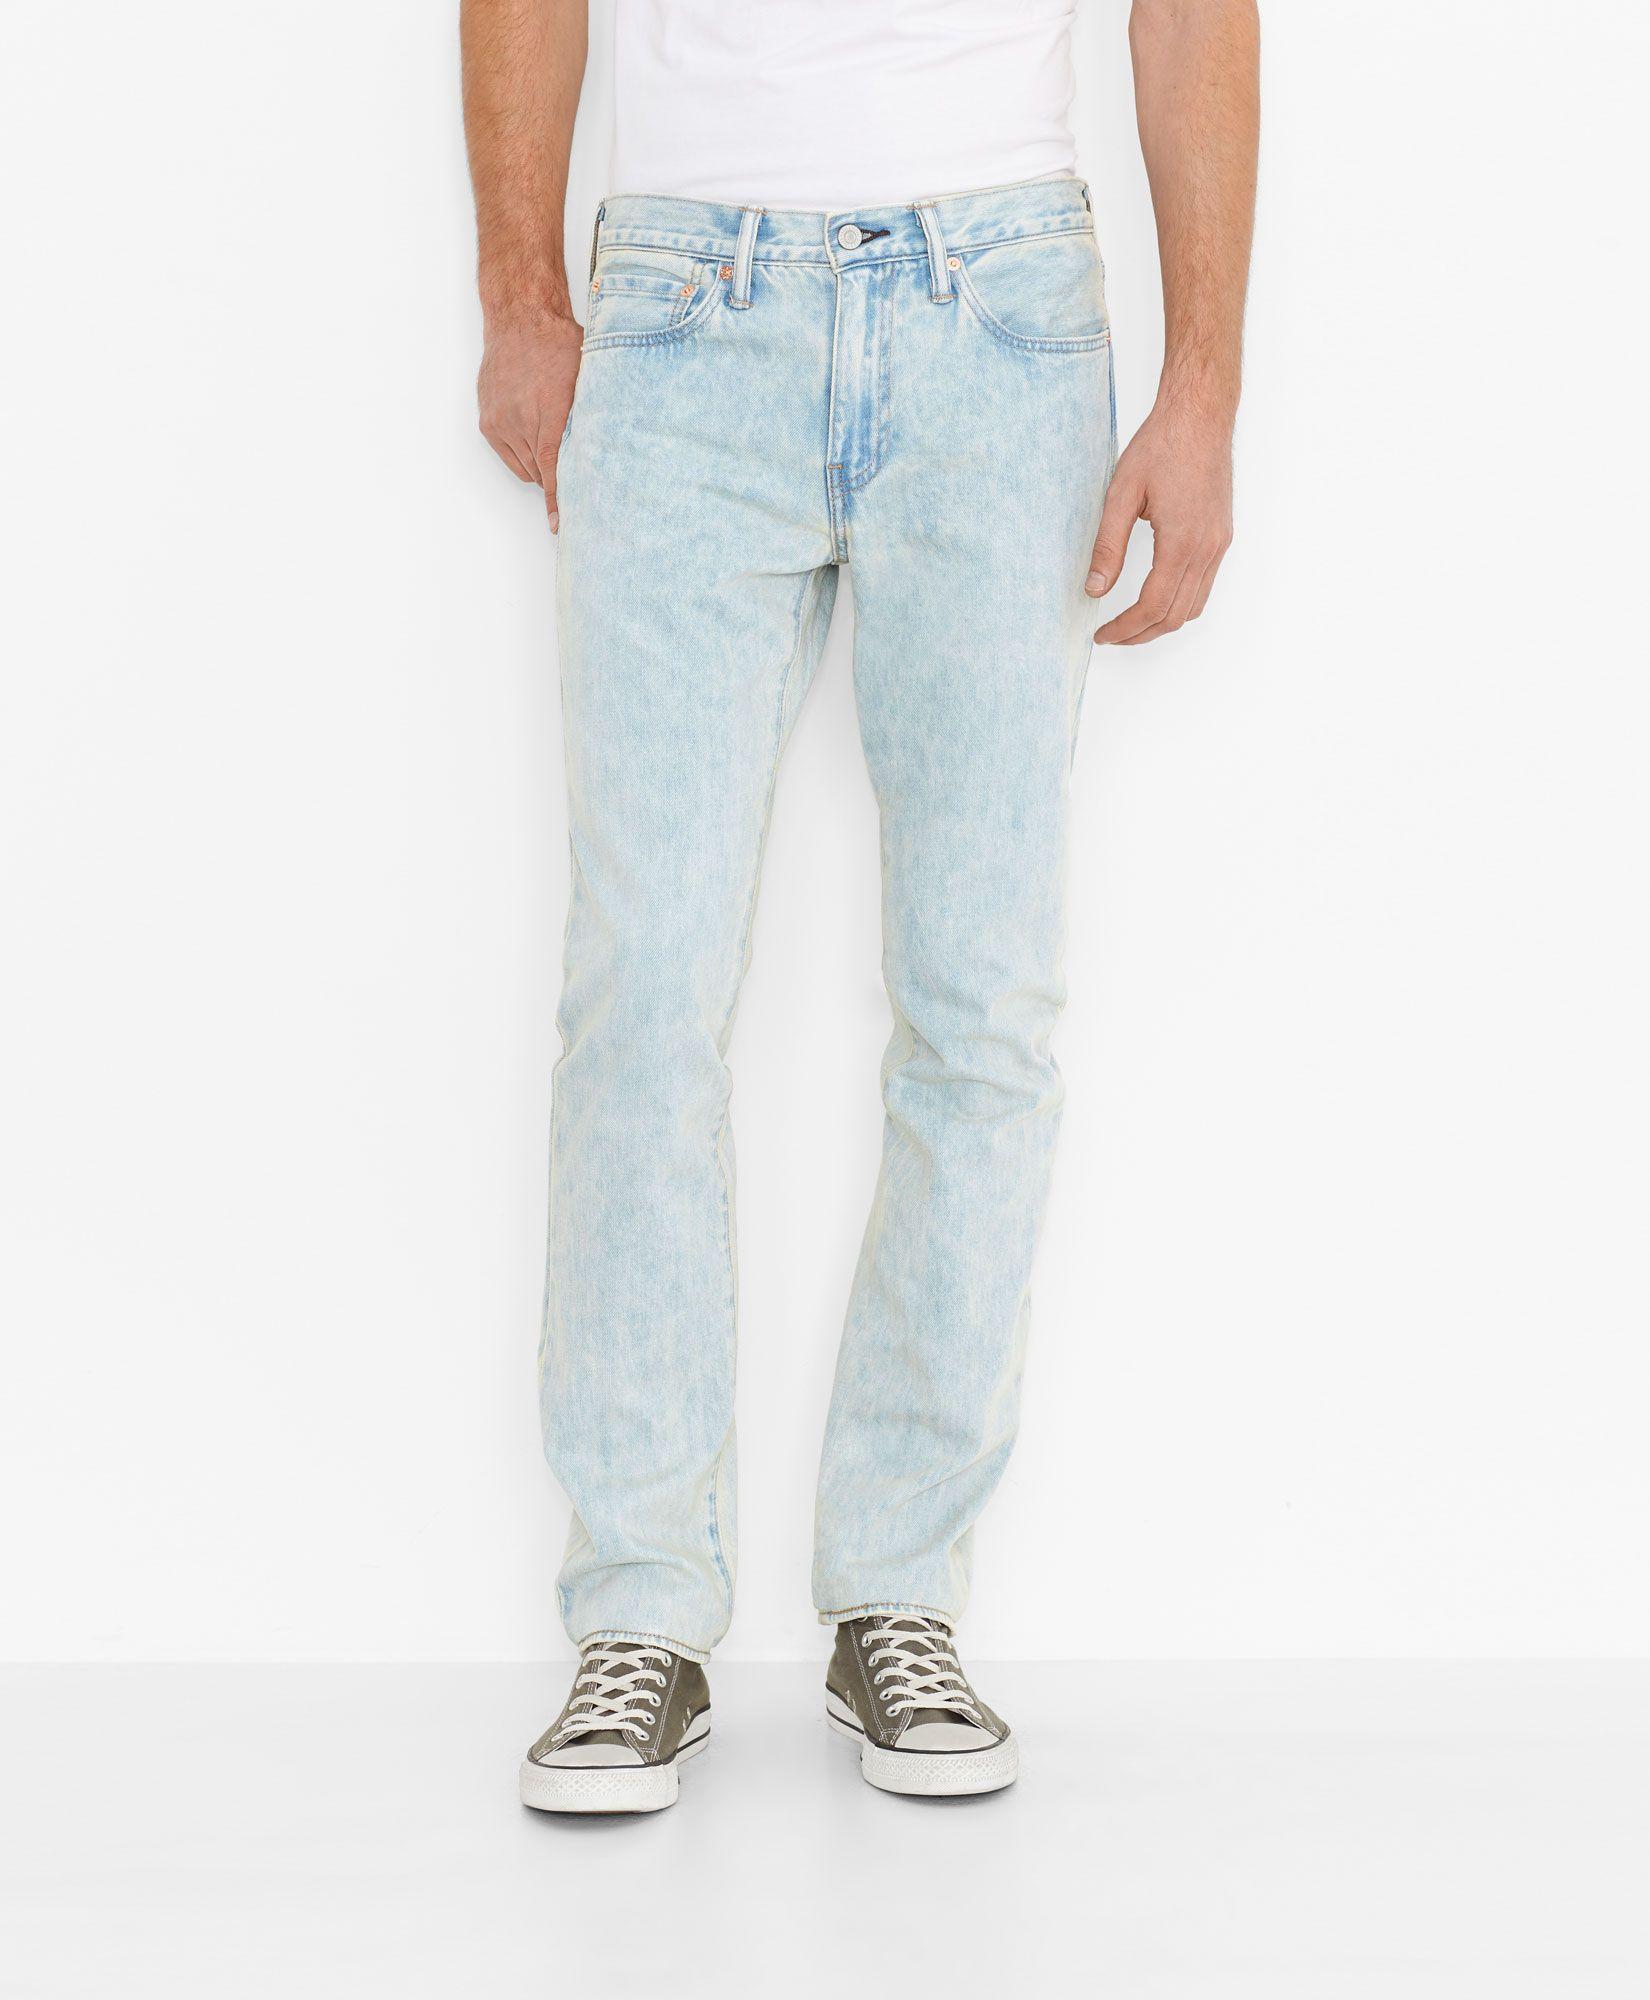 Levi's Demi Curve Slim Fit Jeans Spring Waters Womens Jeans Jeans for Women COLOUR-spring waters